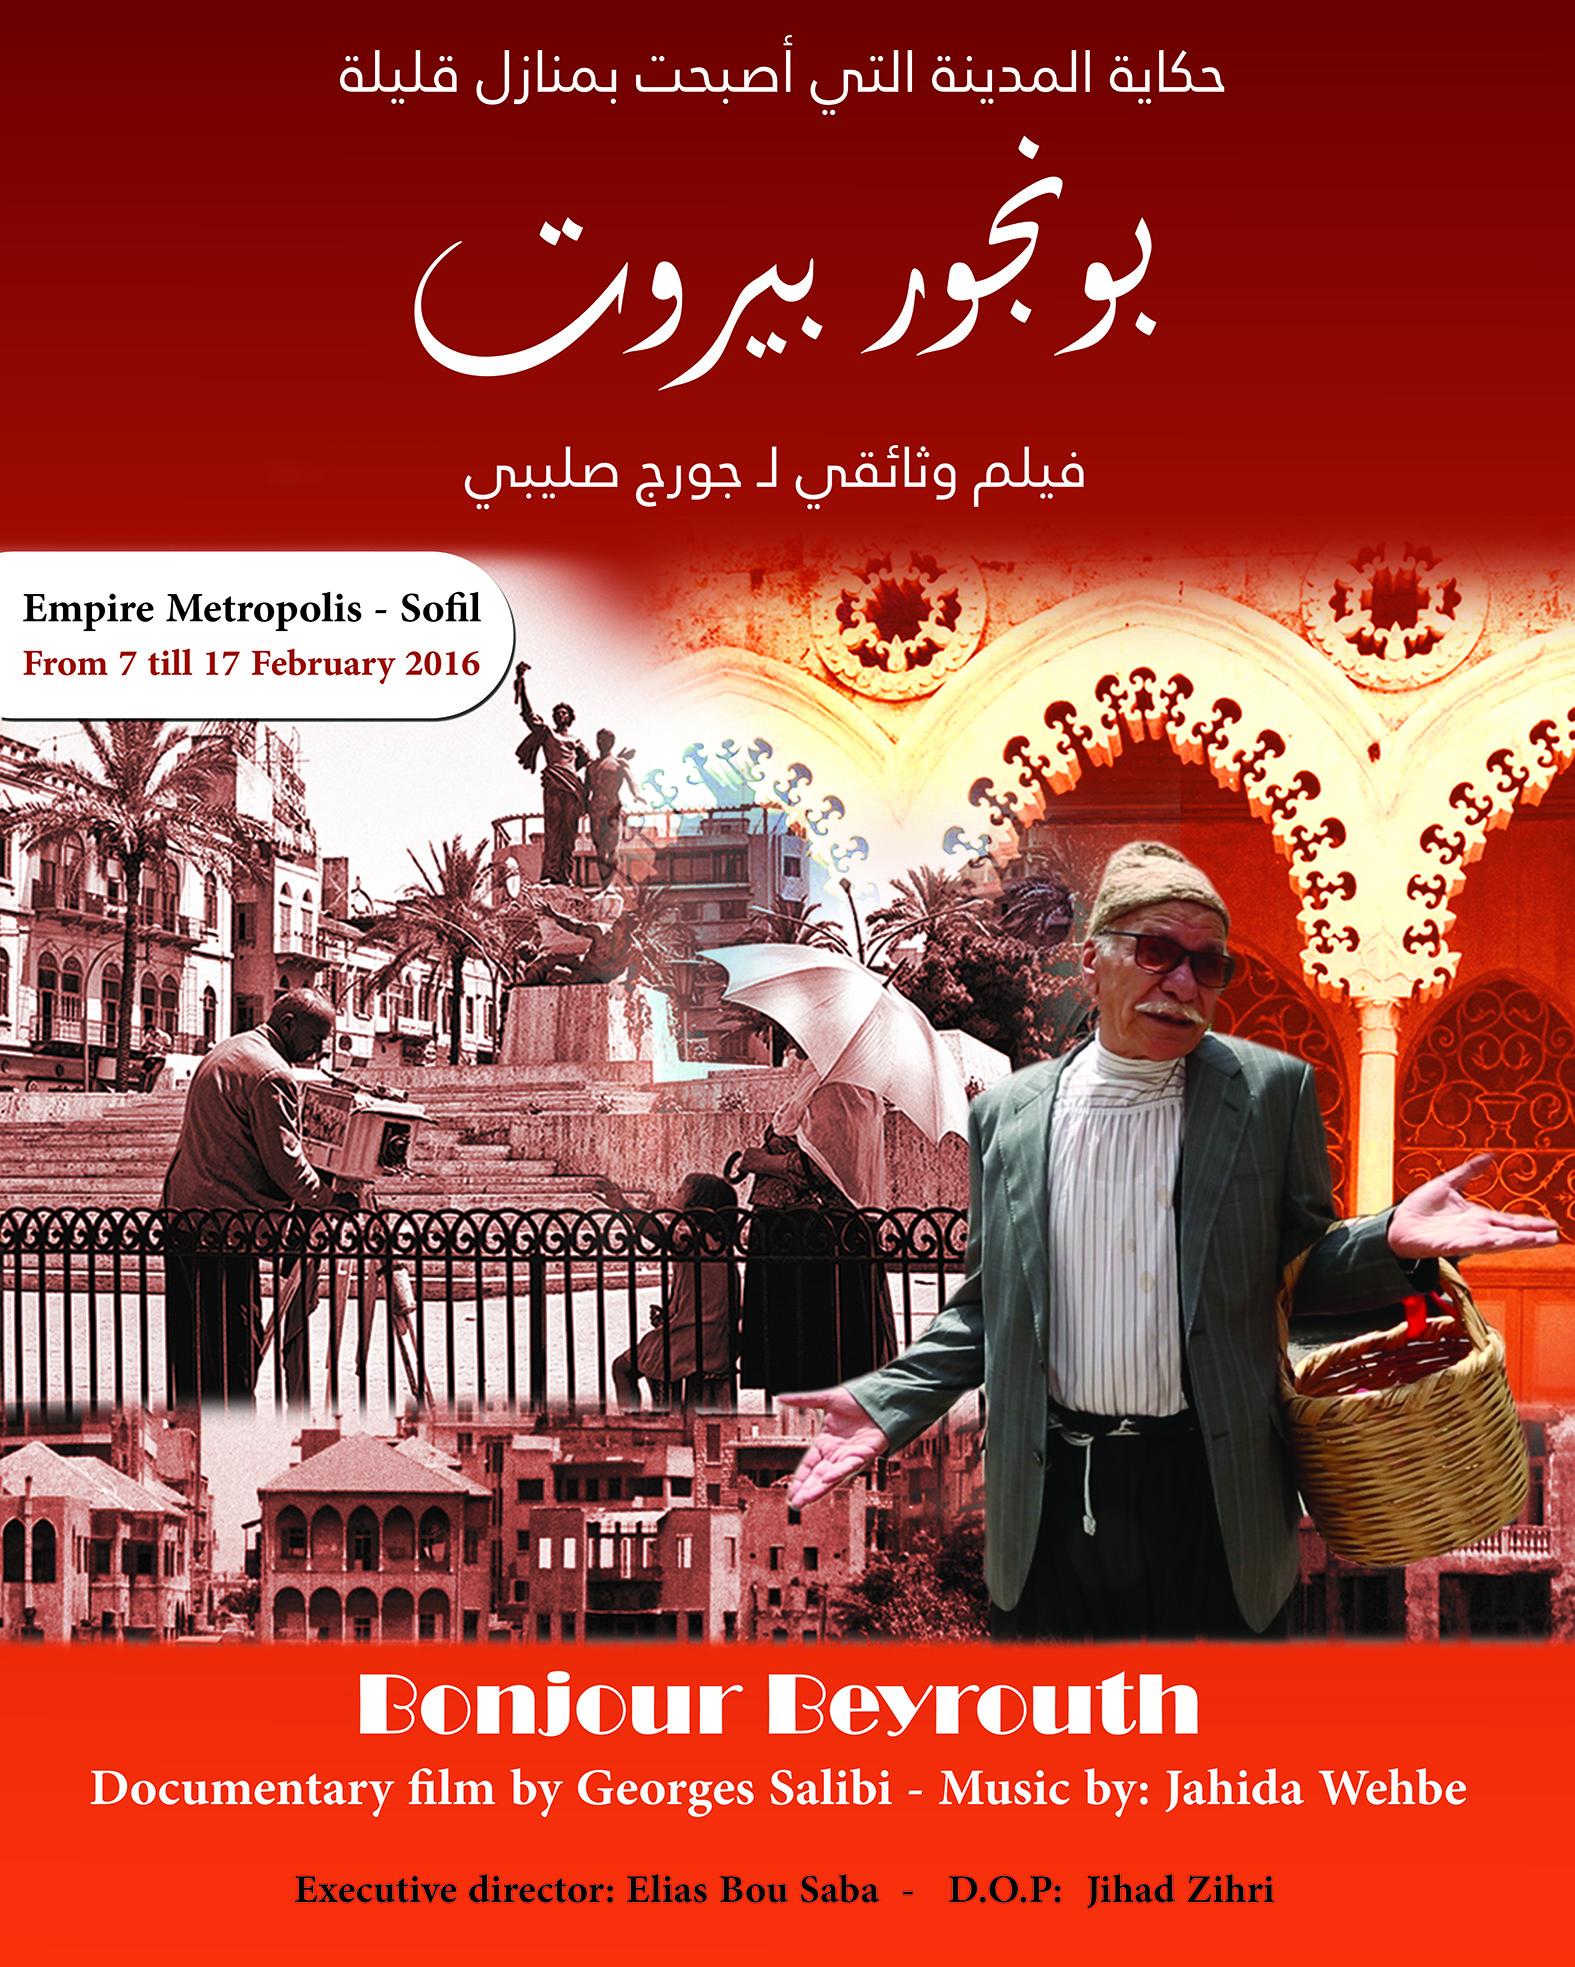 Bonjour Beyrouth